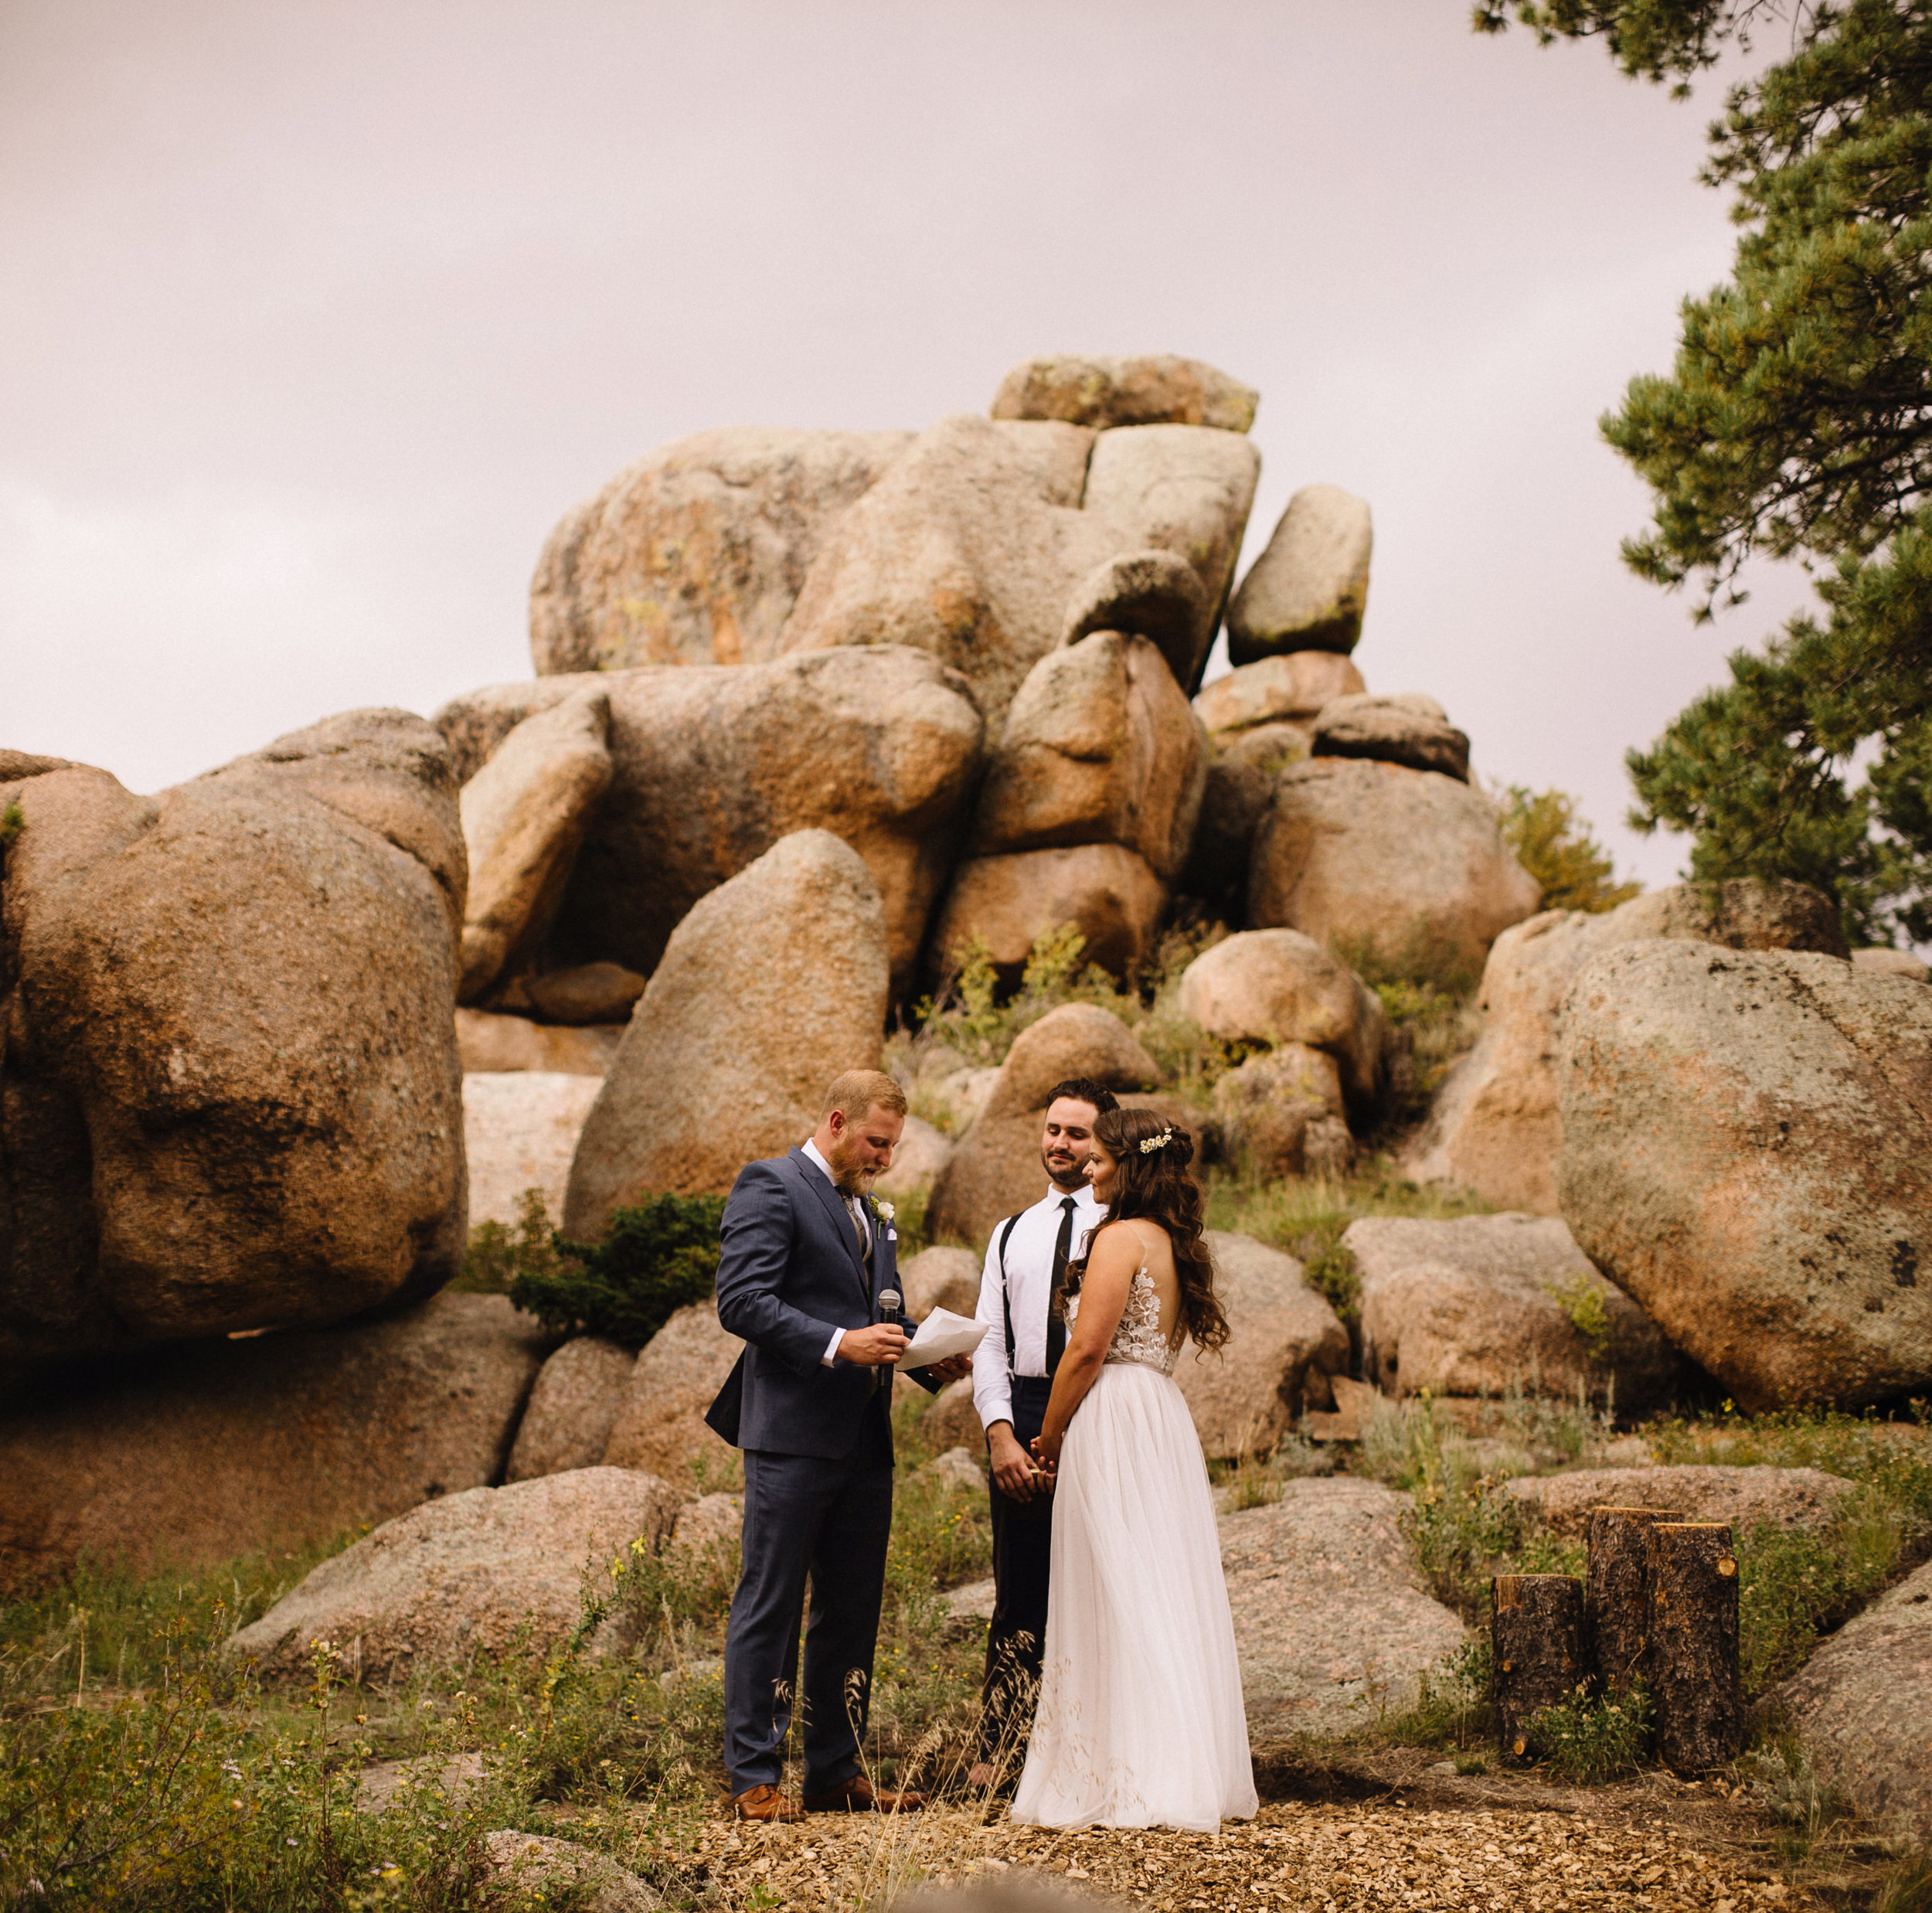 Liz Osban Photography Vedauwoo Buford Wyoming Happy Jack Wedding Elopement Destination Small Forest Cheyenne Laramie Medicine Bow National Forest Ceremony Sarah Taylor7.jpg